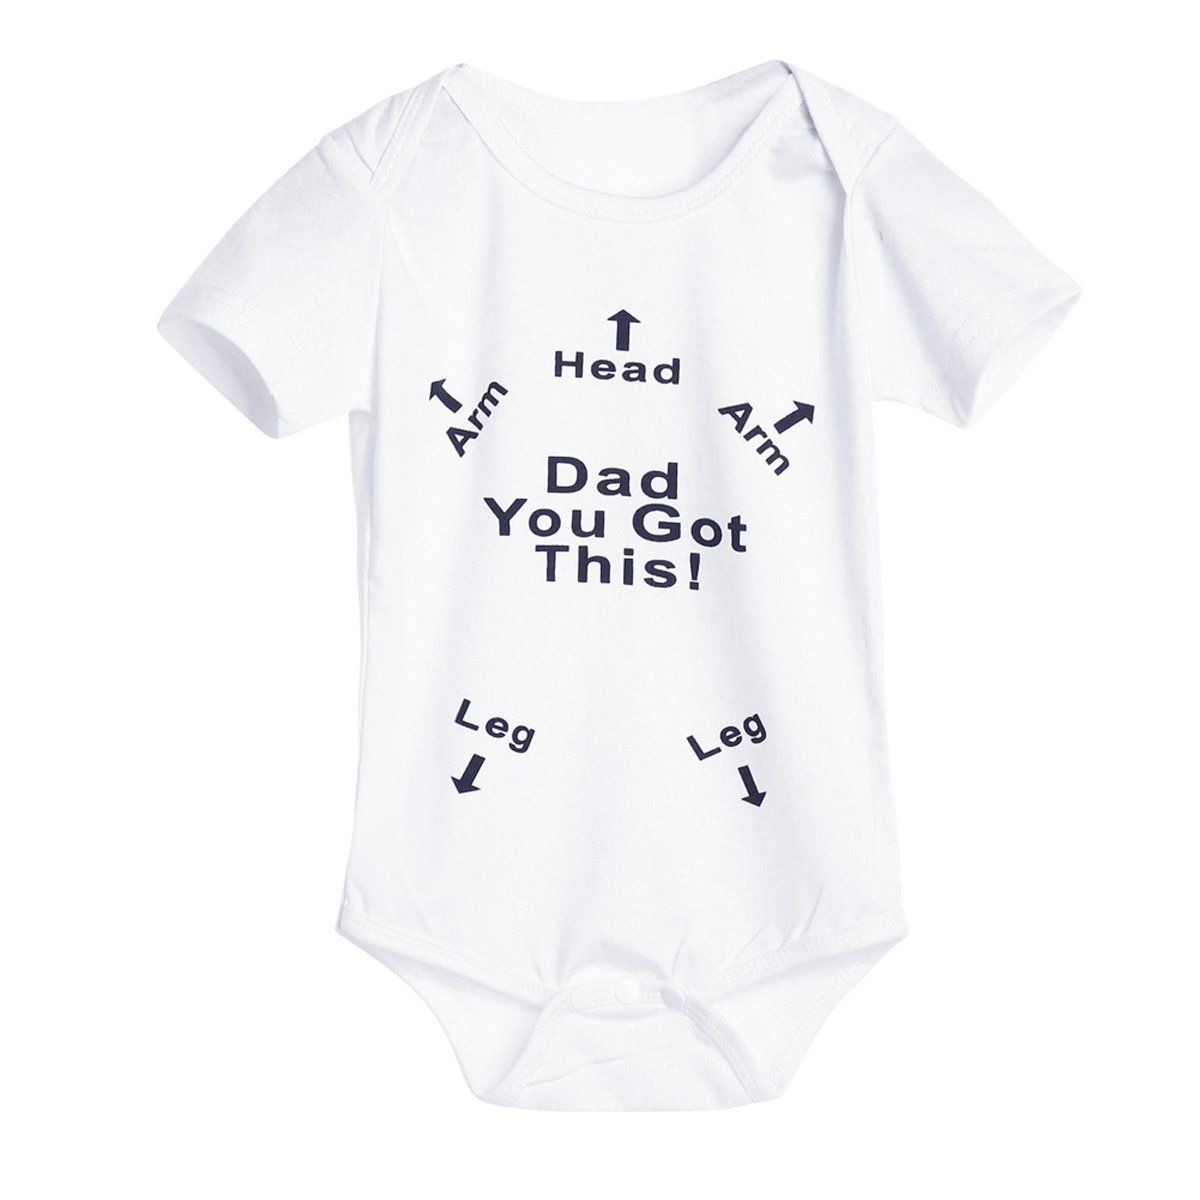 Newborn Kids Baby Boy Girl Summer Letter Print Romper Jumpsuit